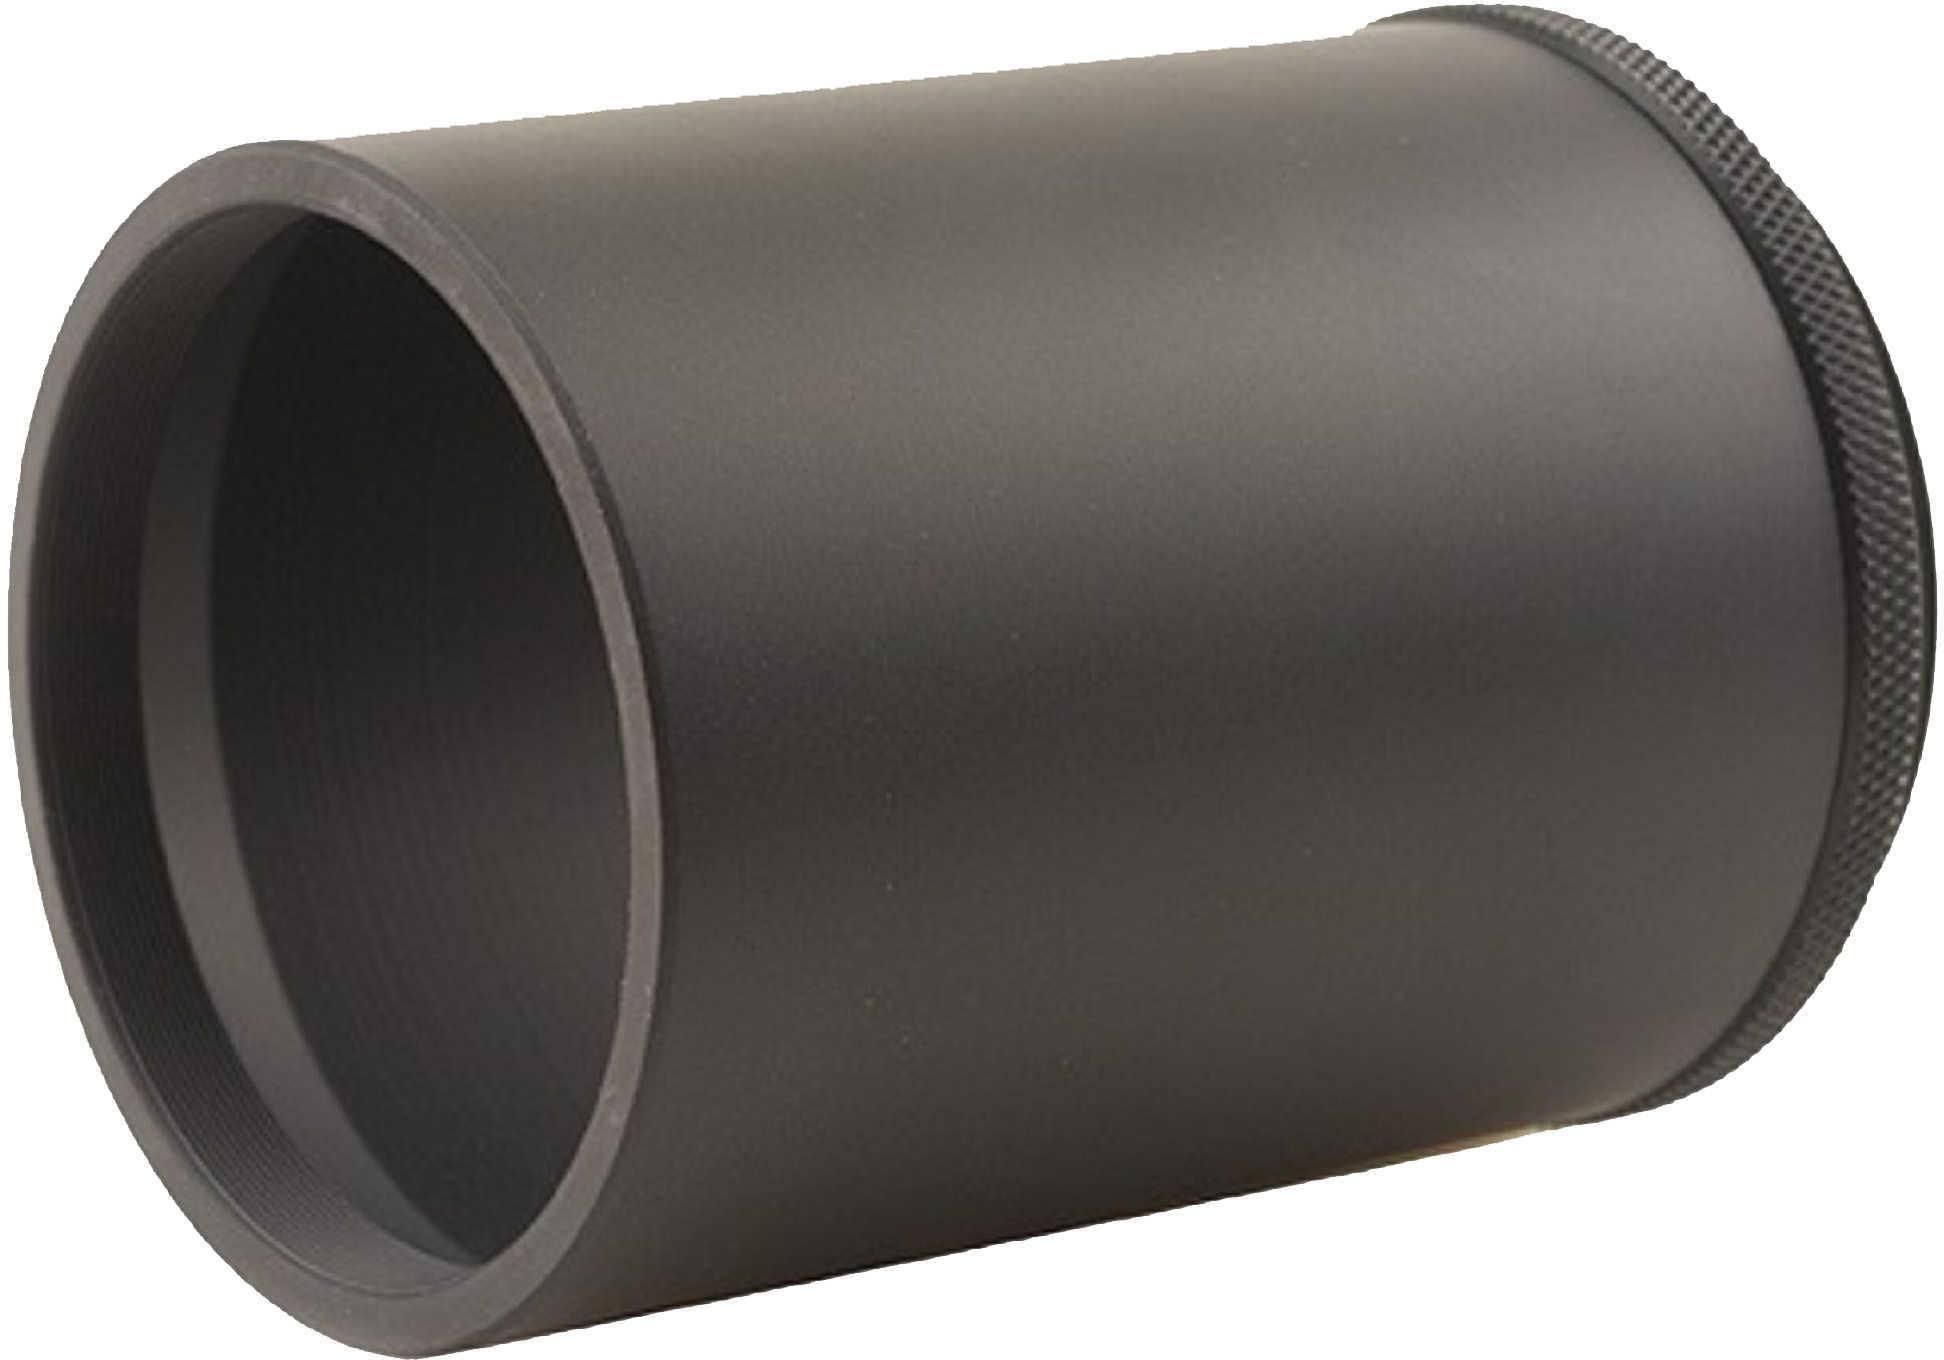 Burris Sunshade MTAC 6.5X-20X-50mm,E1,Ff II Md: 626032